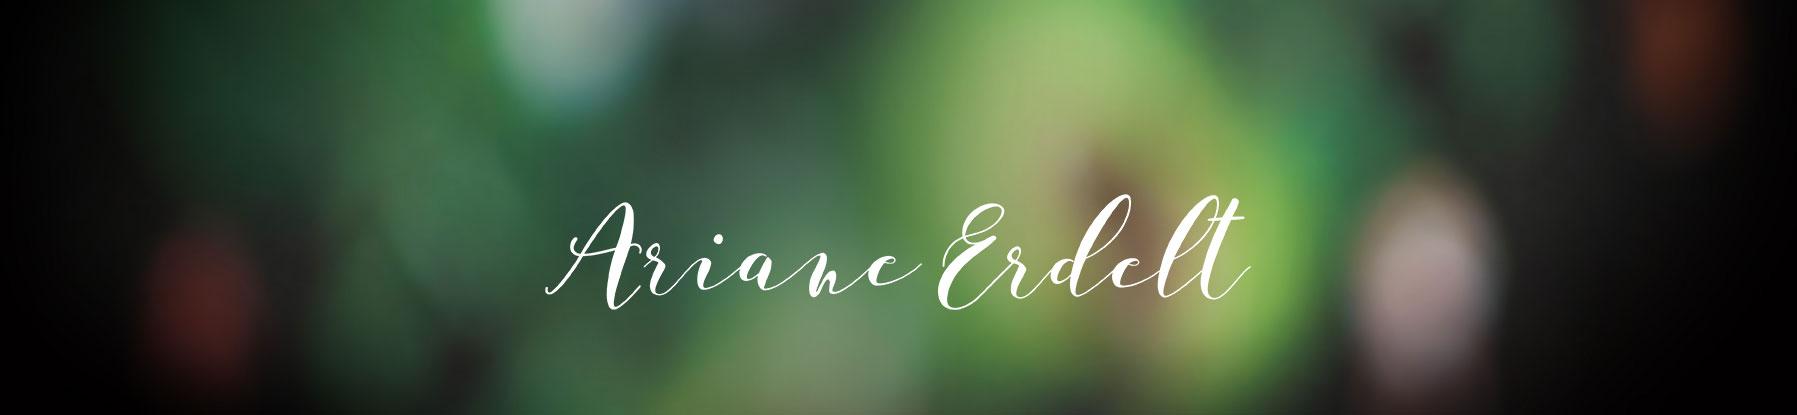 Ariane Erdelt Coaching - Headline